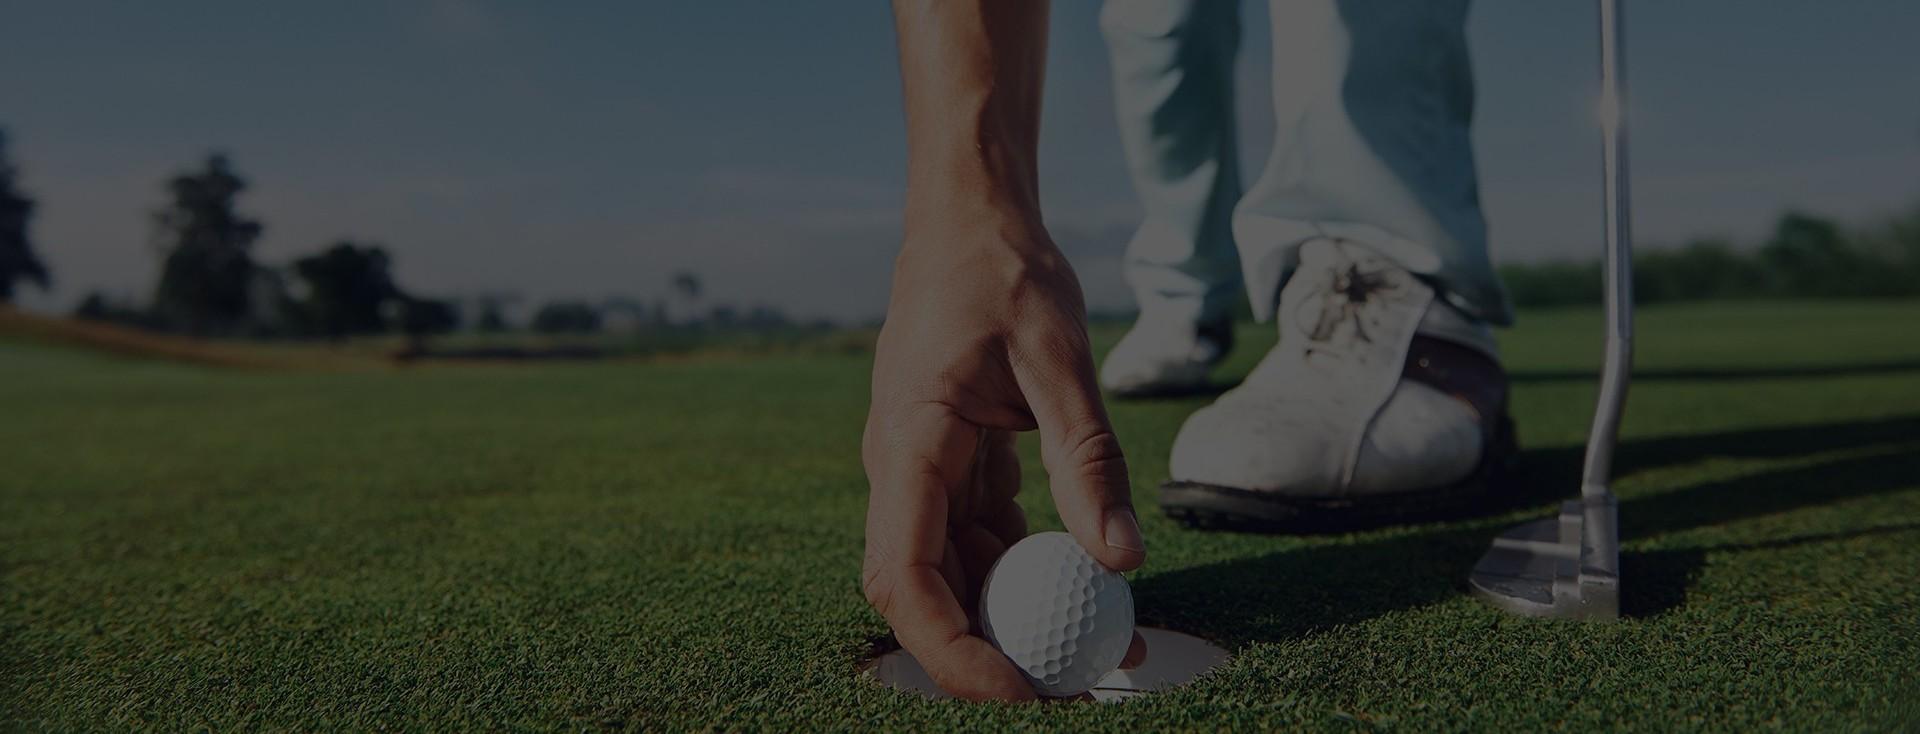 digital-marketing-case-study-golf-just-tee-times-e1444386887607